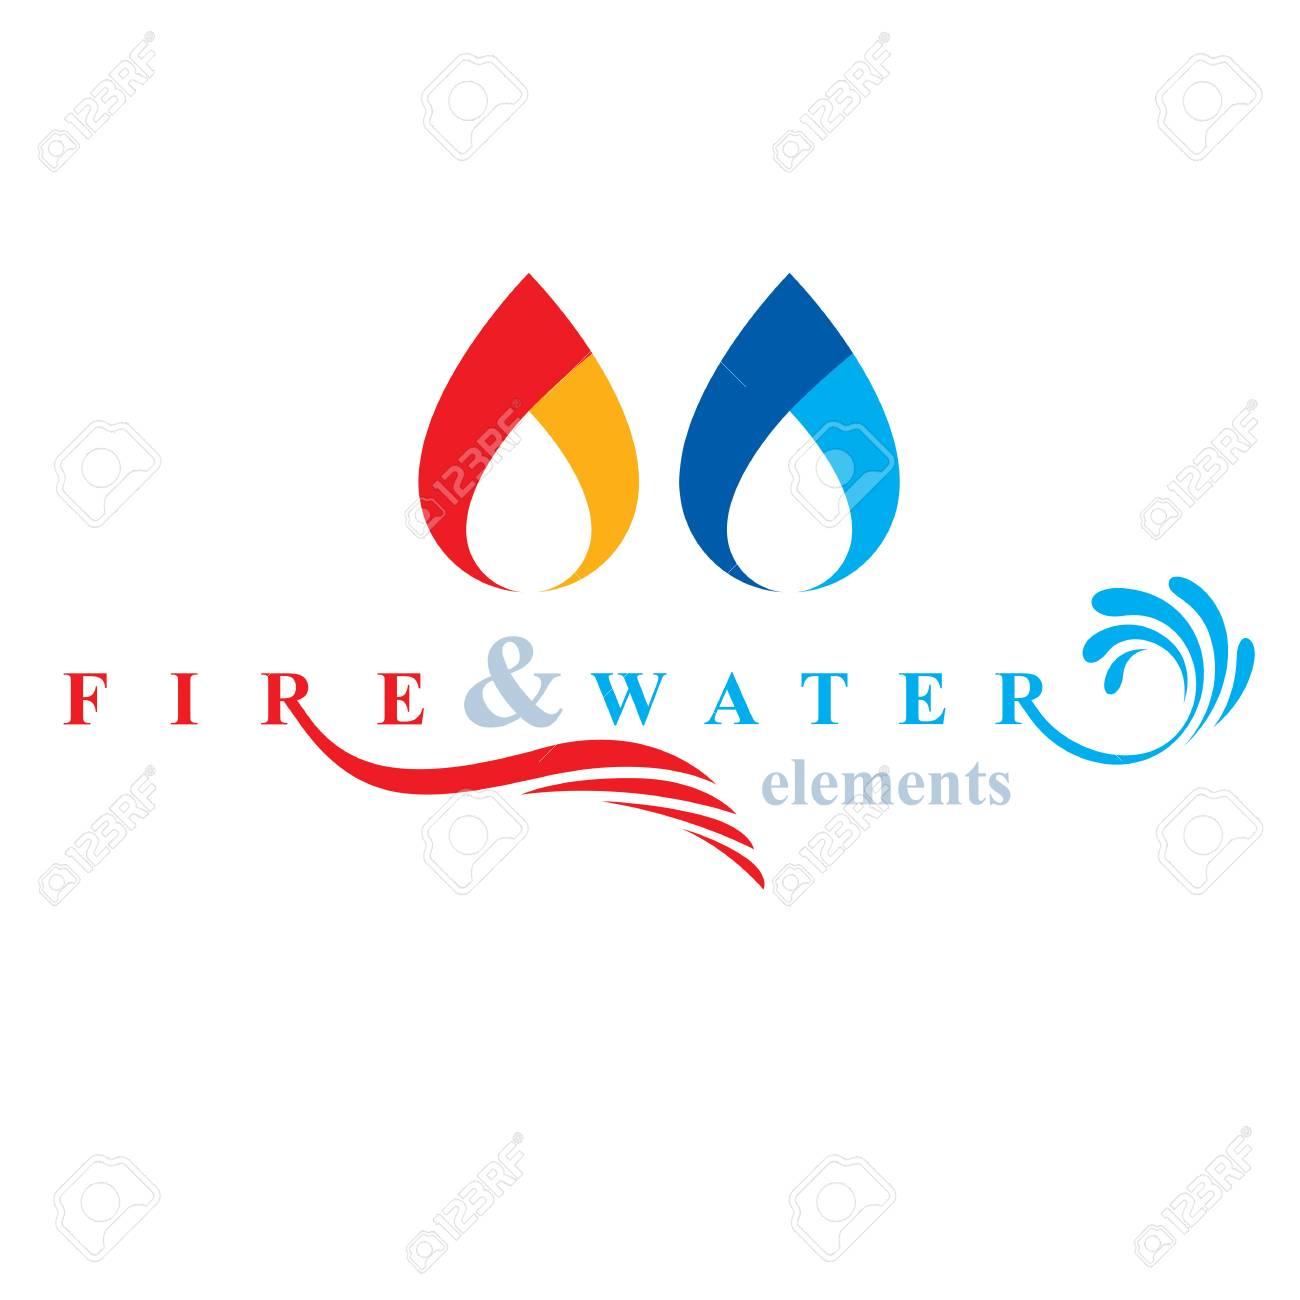 Nature elements harmony logo for use as corporate emblem fire nature elements harmony logo for use as corporate emblem fire and water balance stock biocorpaavc Choice Image